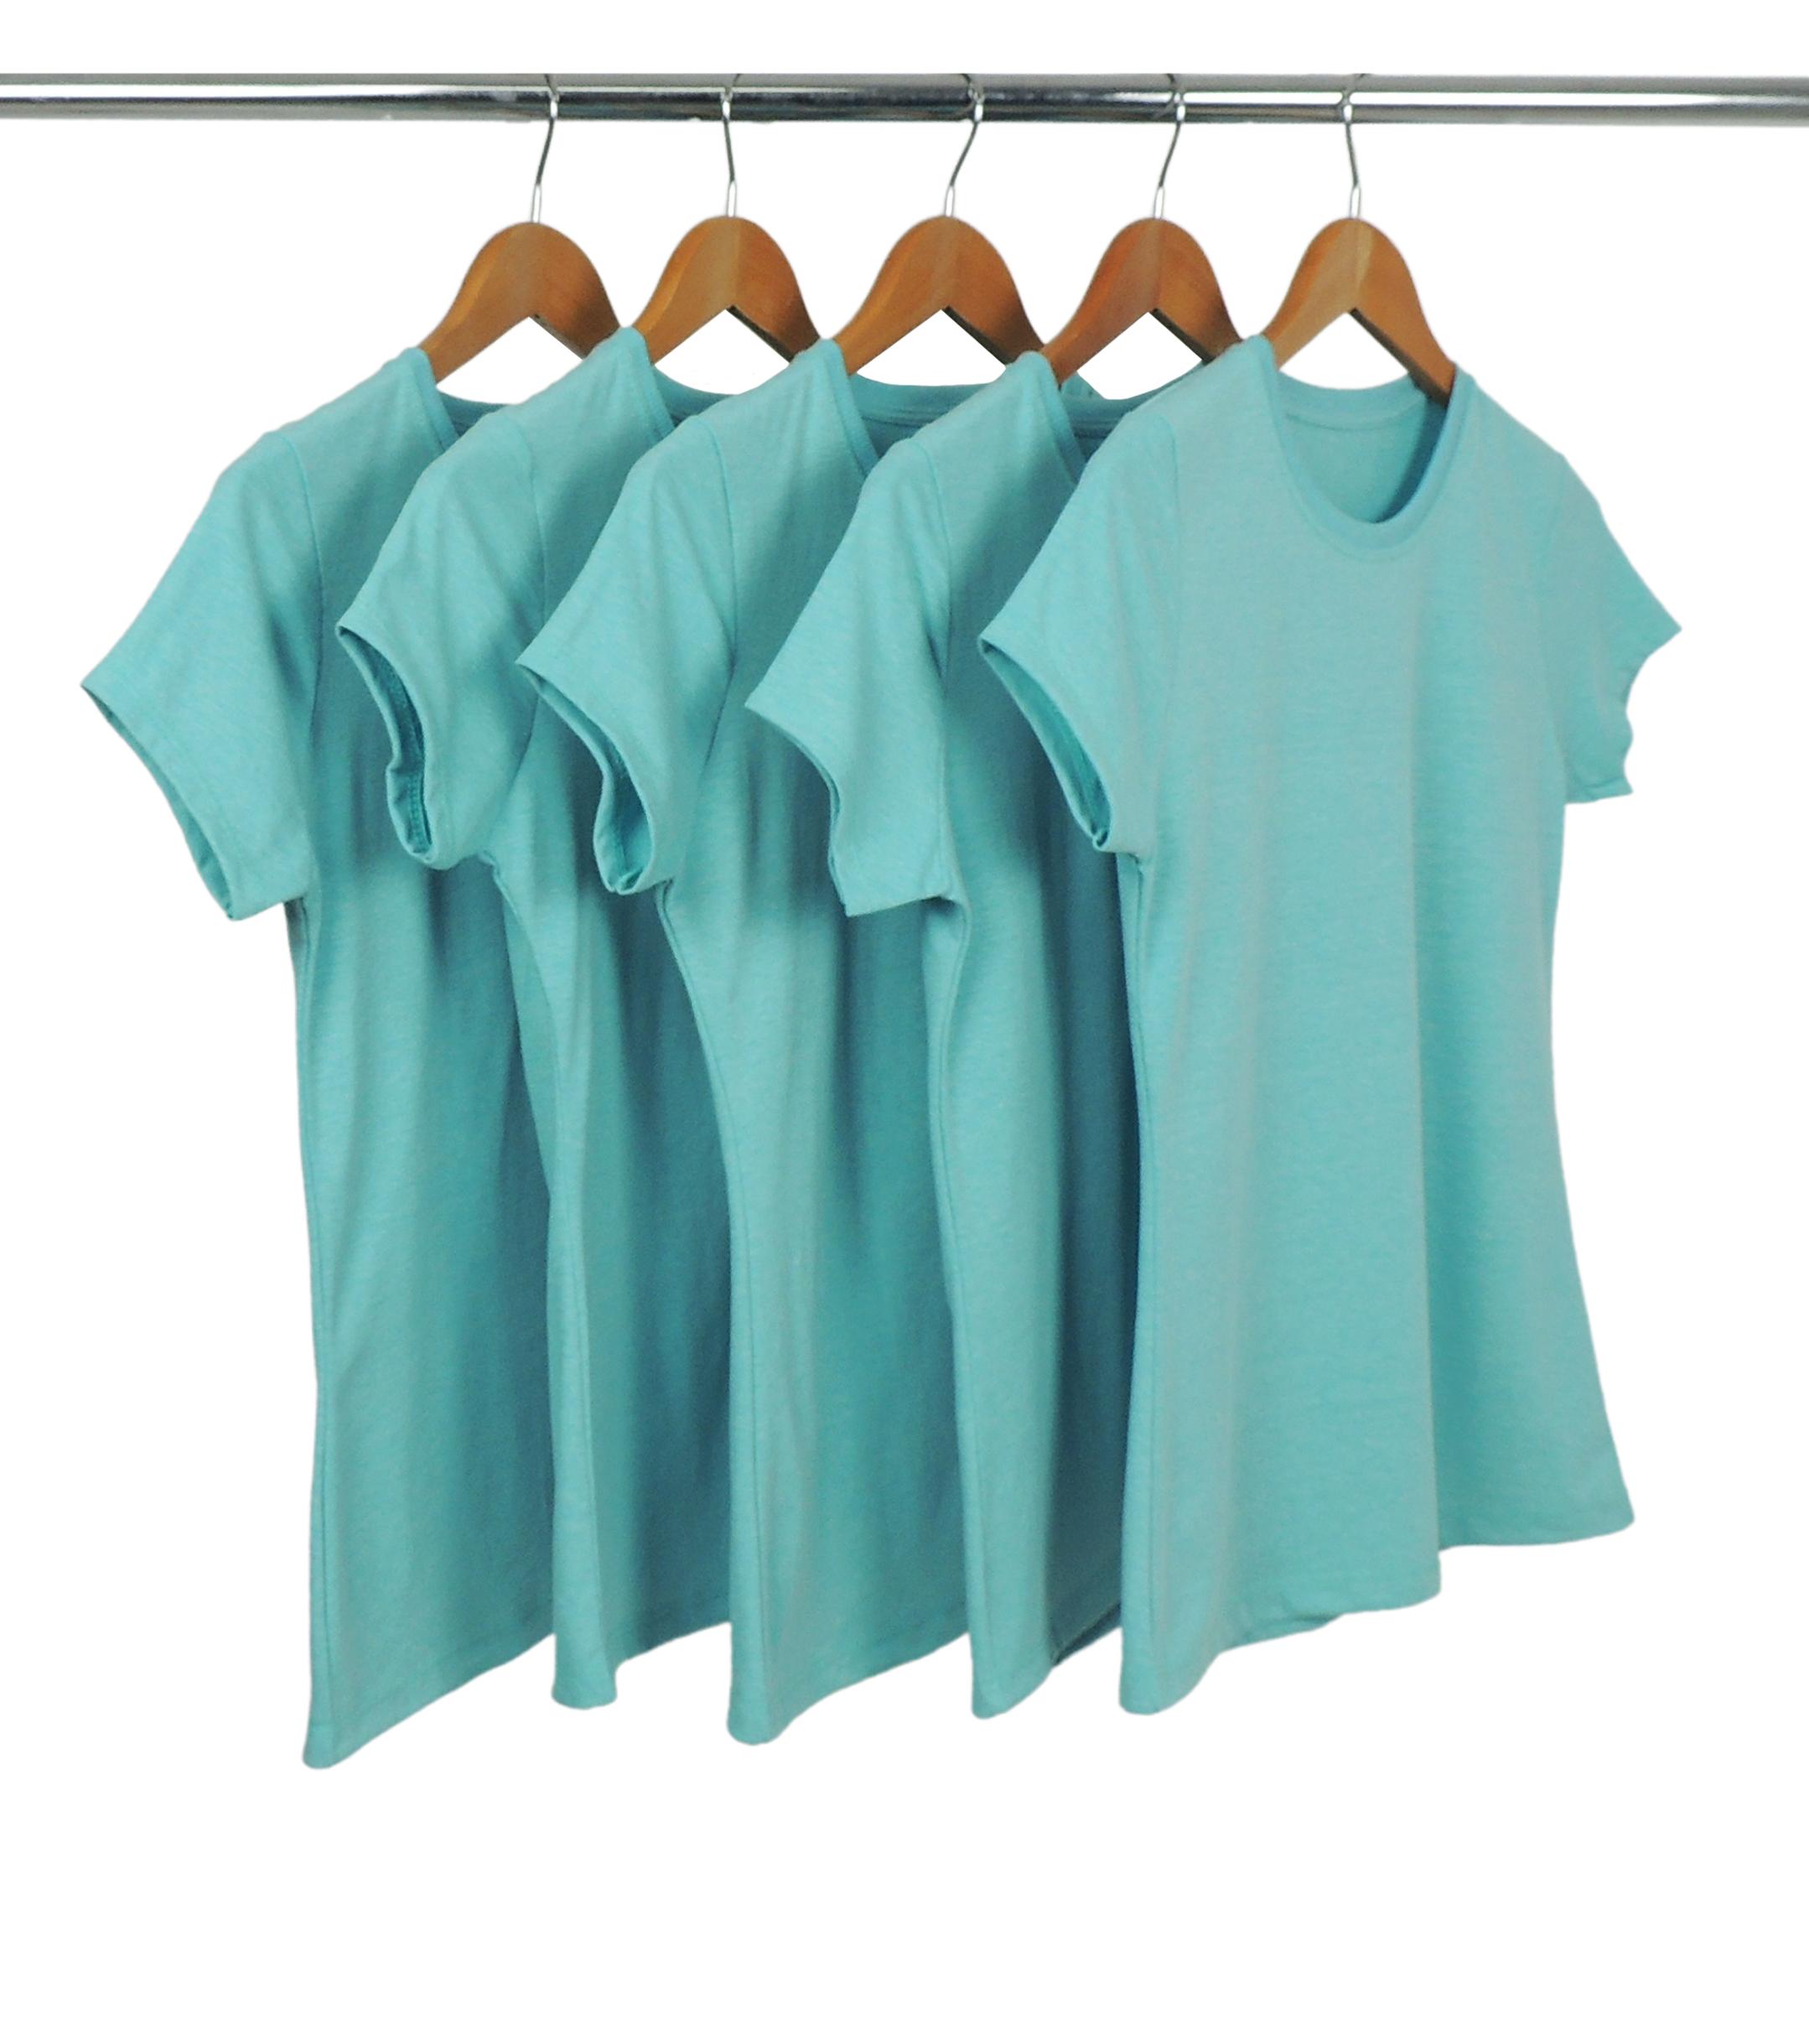 Kit 5 Camisetas Femininas Comfort Mescla Azul Turquesa